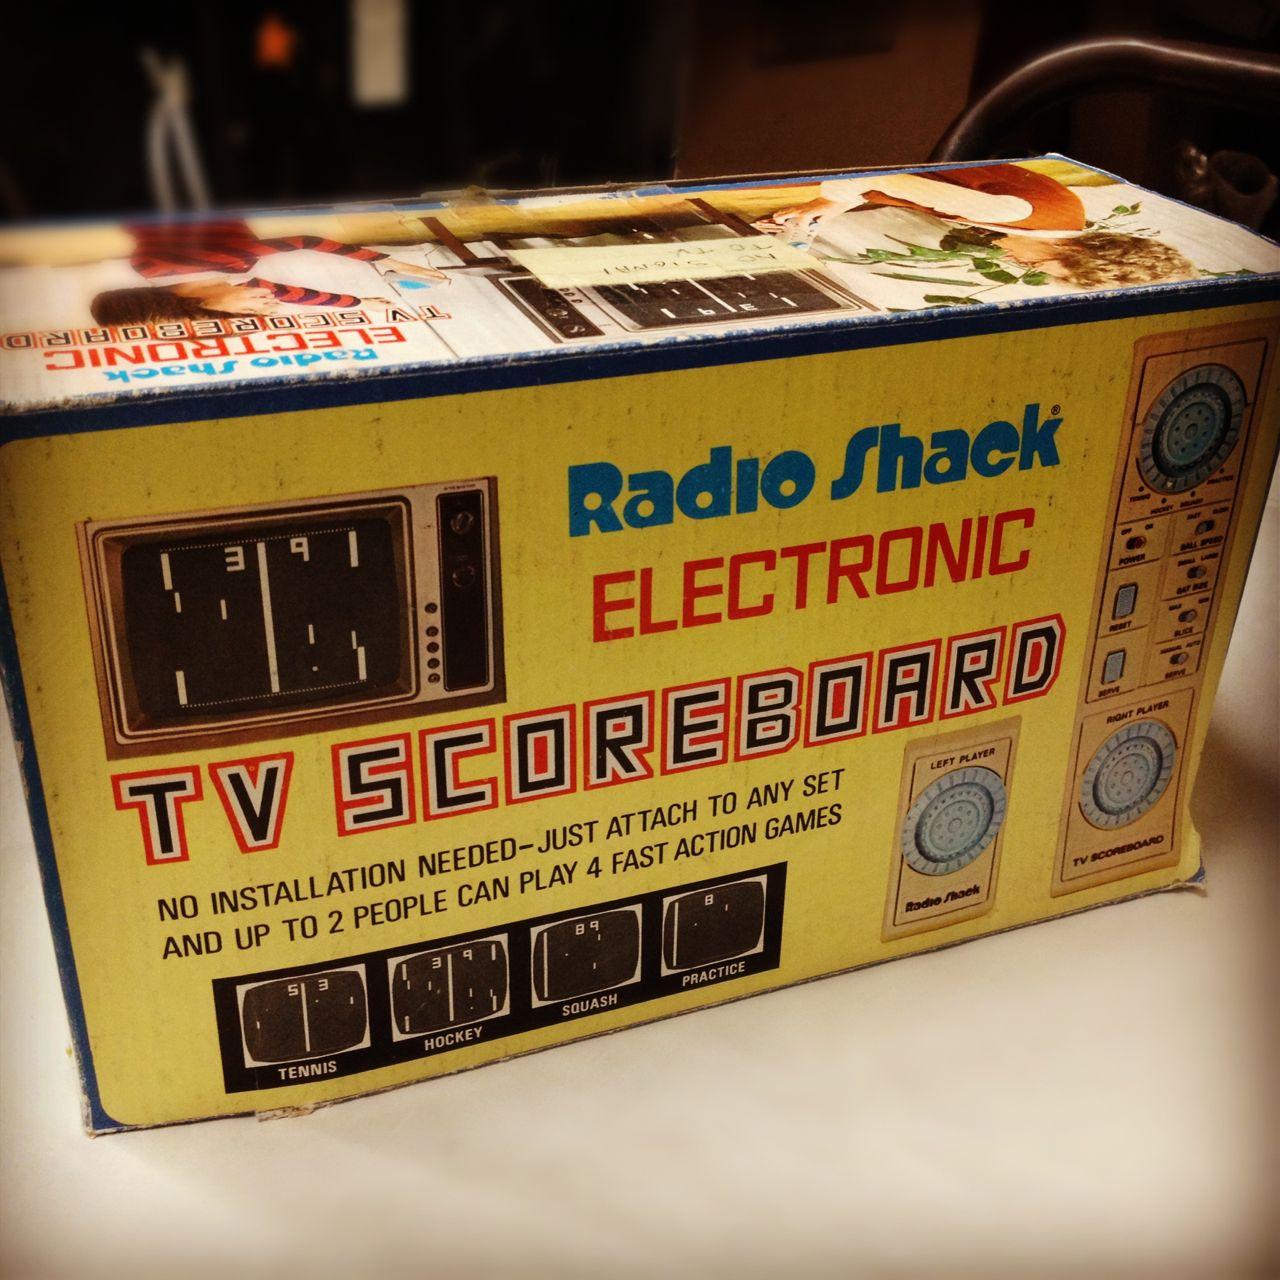 Radio Shack Stores: Tales From The Junk Store: Radio Shack TV Scoreboard